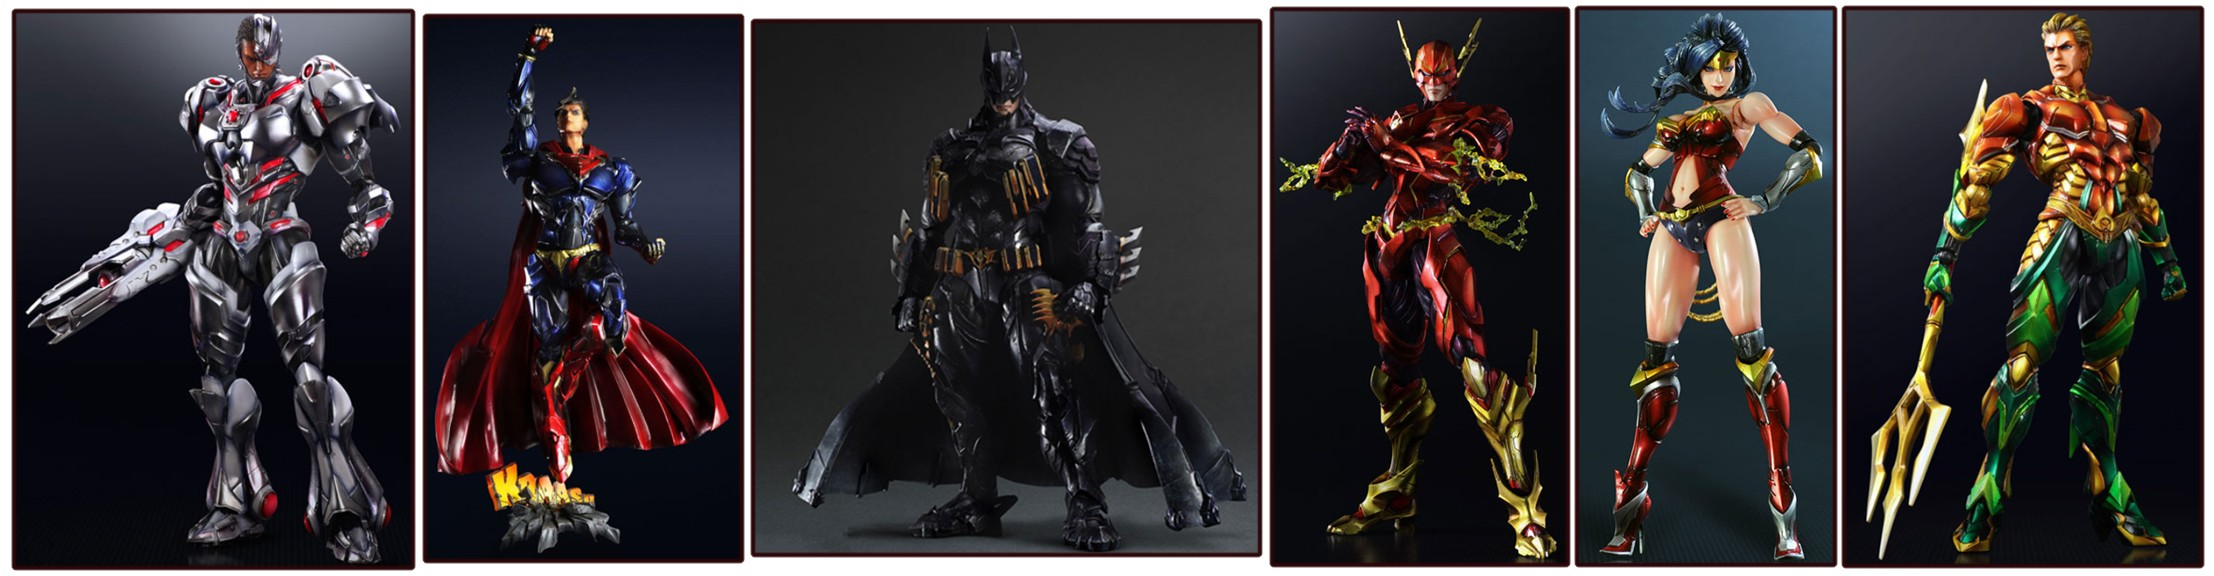 Square Enix – Variant Play Arts Kai: DC Universe Figures